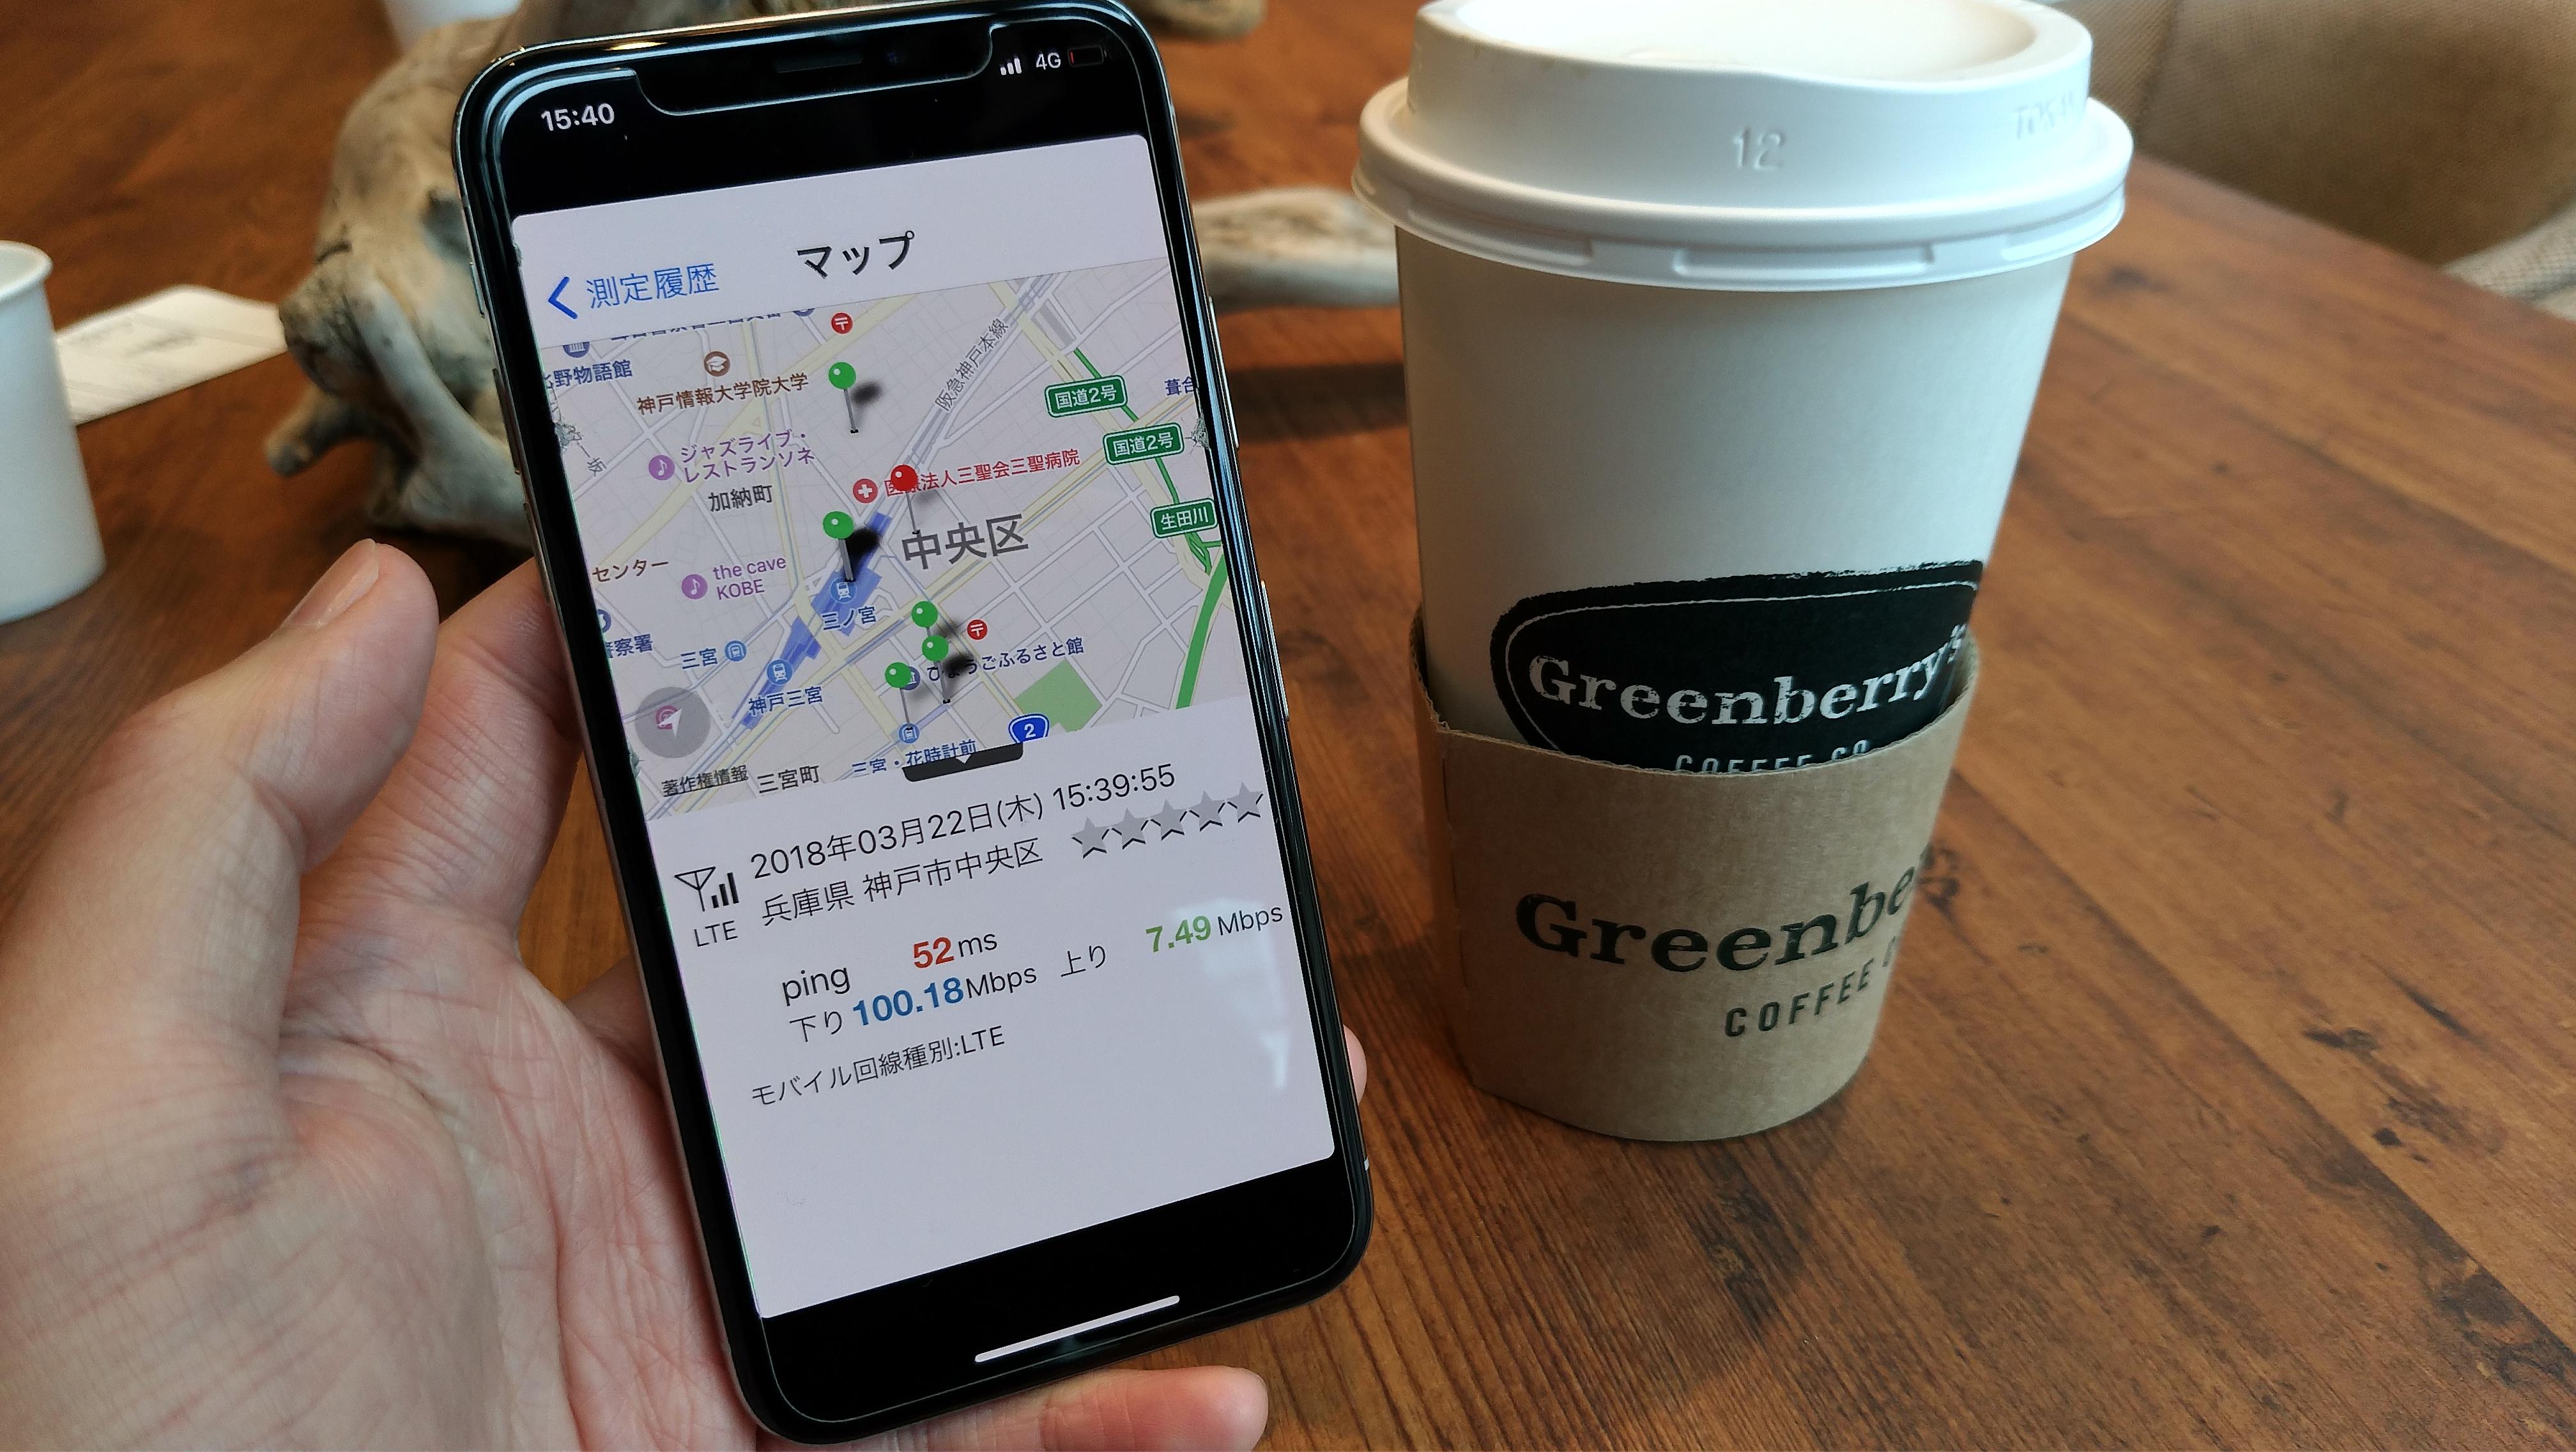 GreenBerry's Coffee